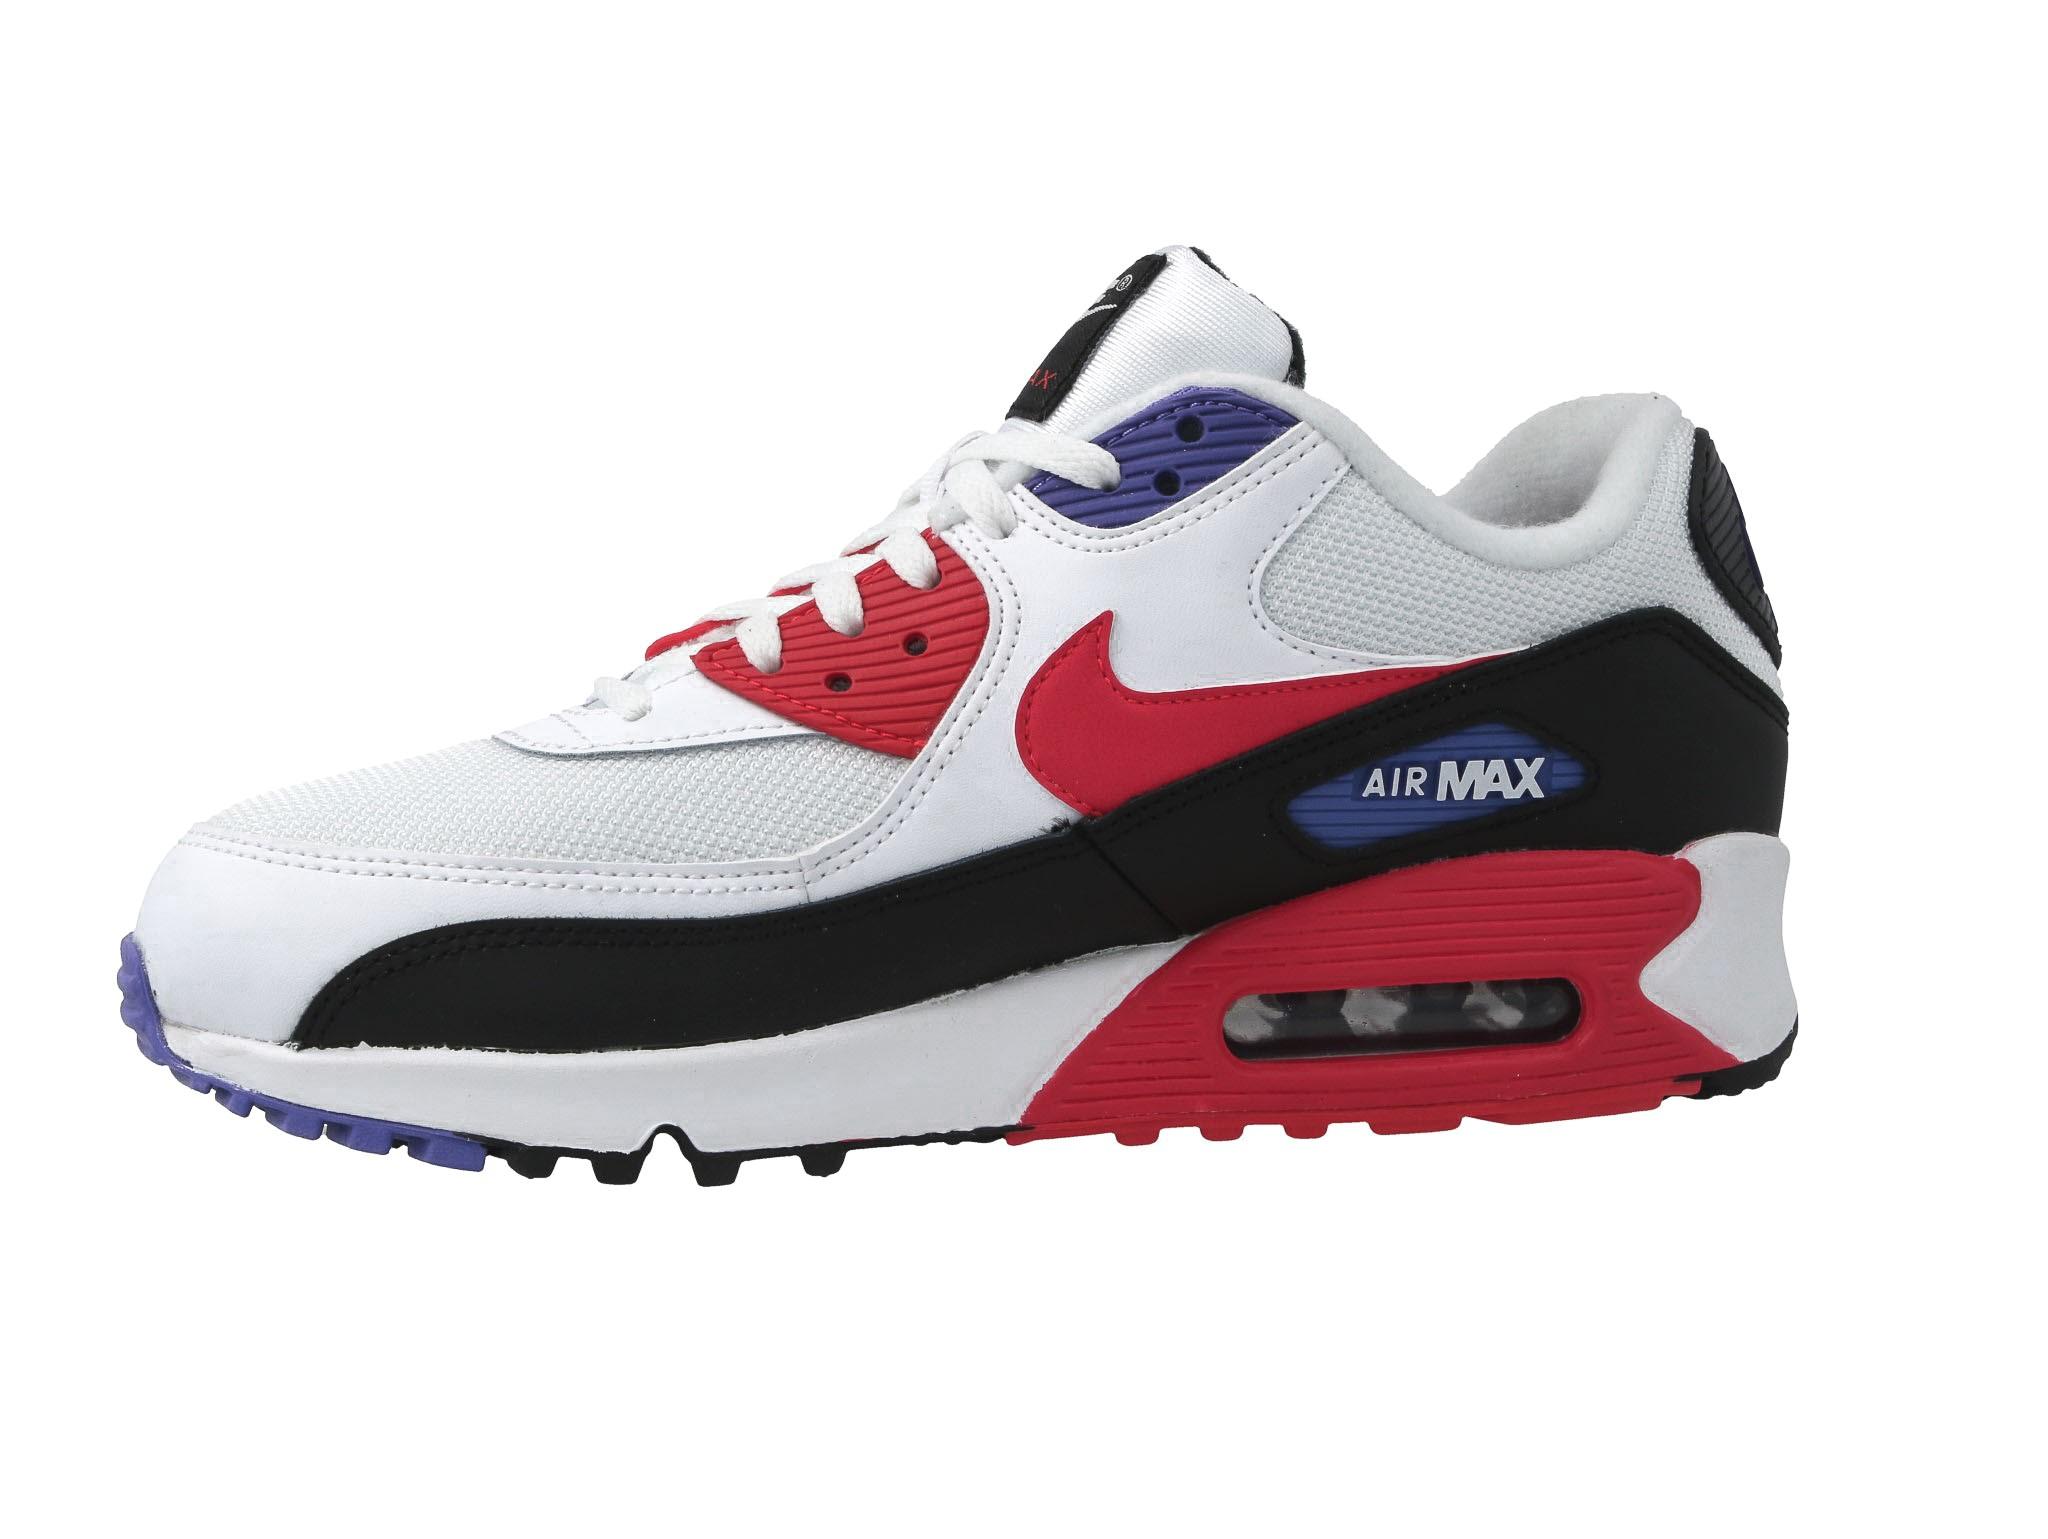 Shoes NIKE Air Max 90 Essential AJ1285 106 WhiteRed Orbit